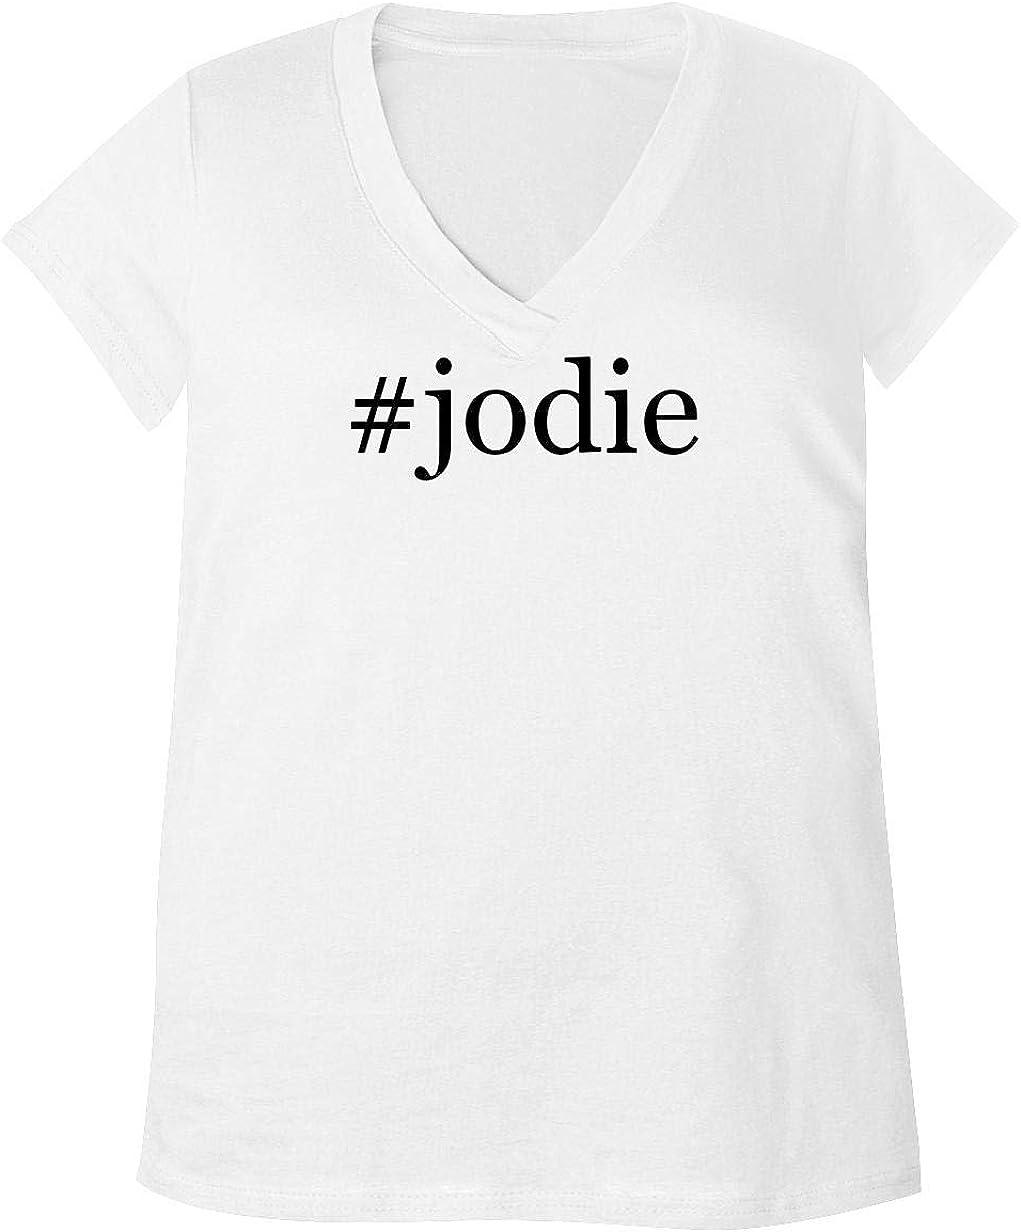 #Jodie - Adult Bella + Canvas B6035 Women'S V-Neck T-Shirt